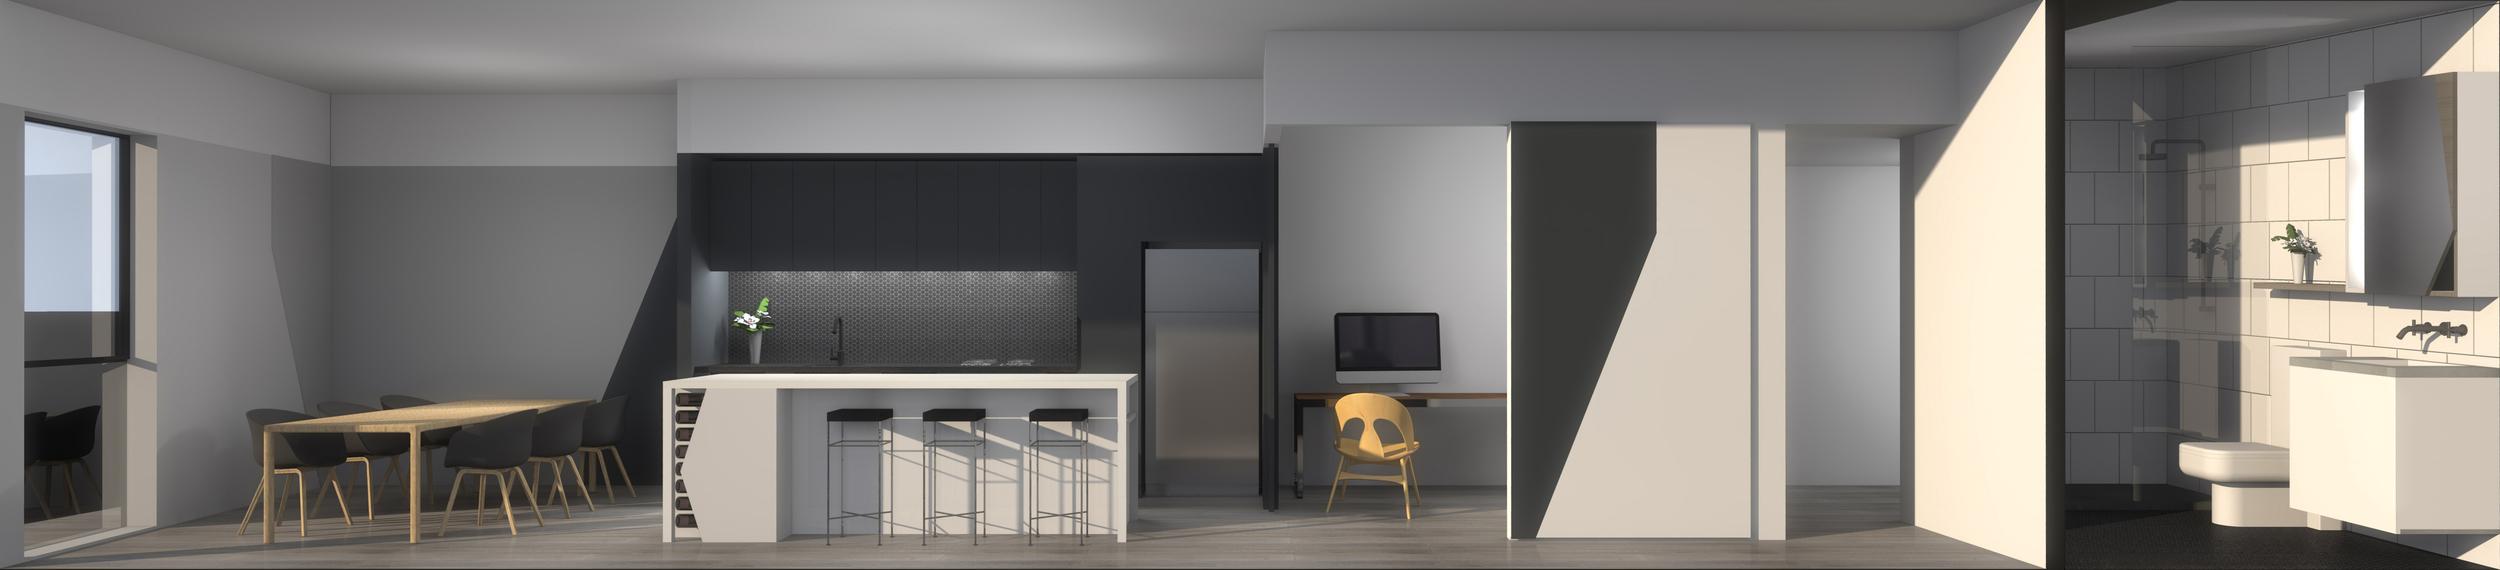 In-house rendering  Design development of internal schemes conveyed through in house renders